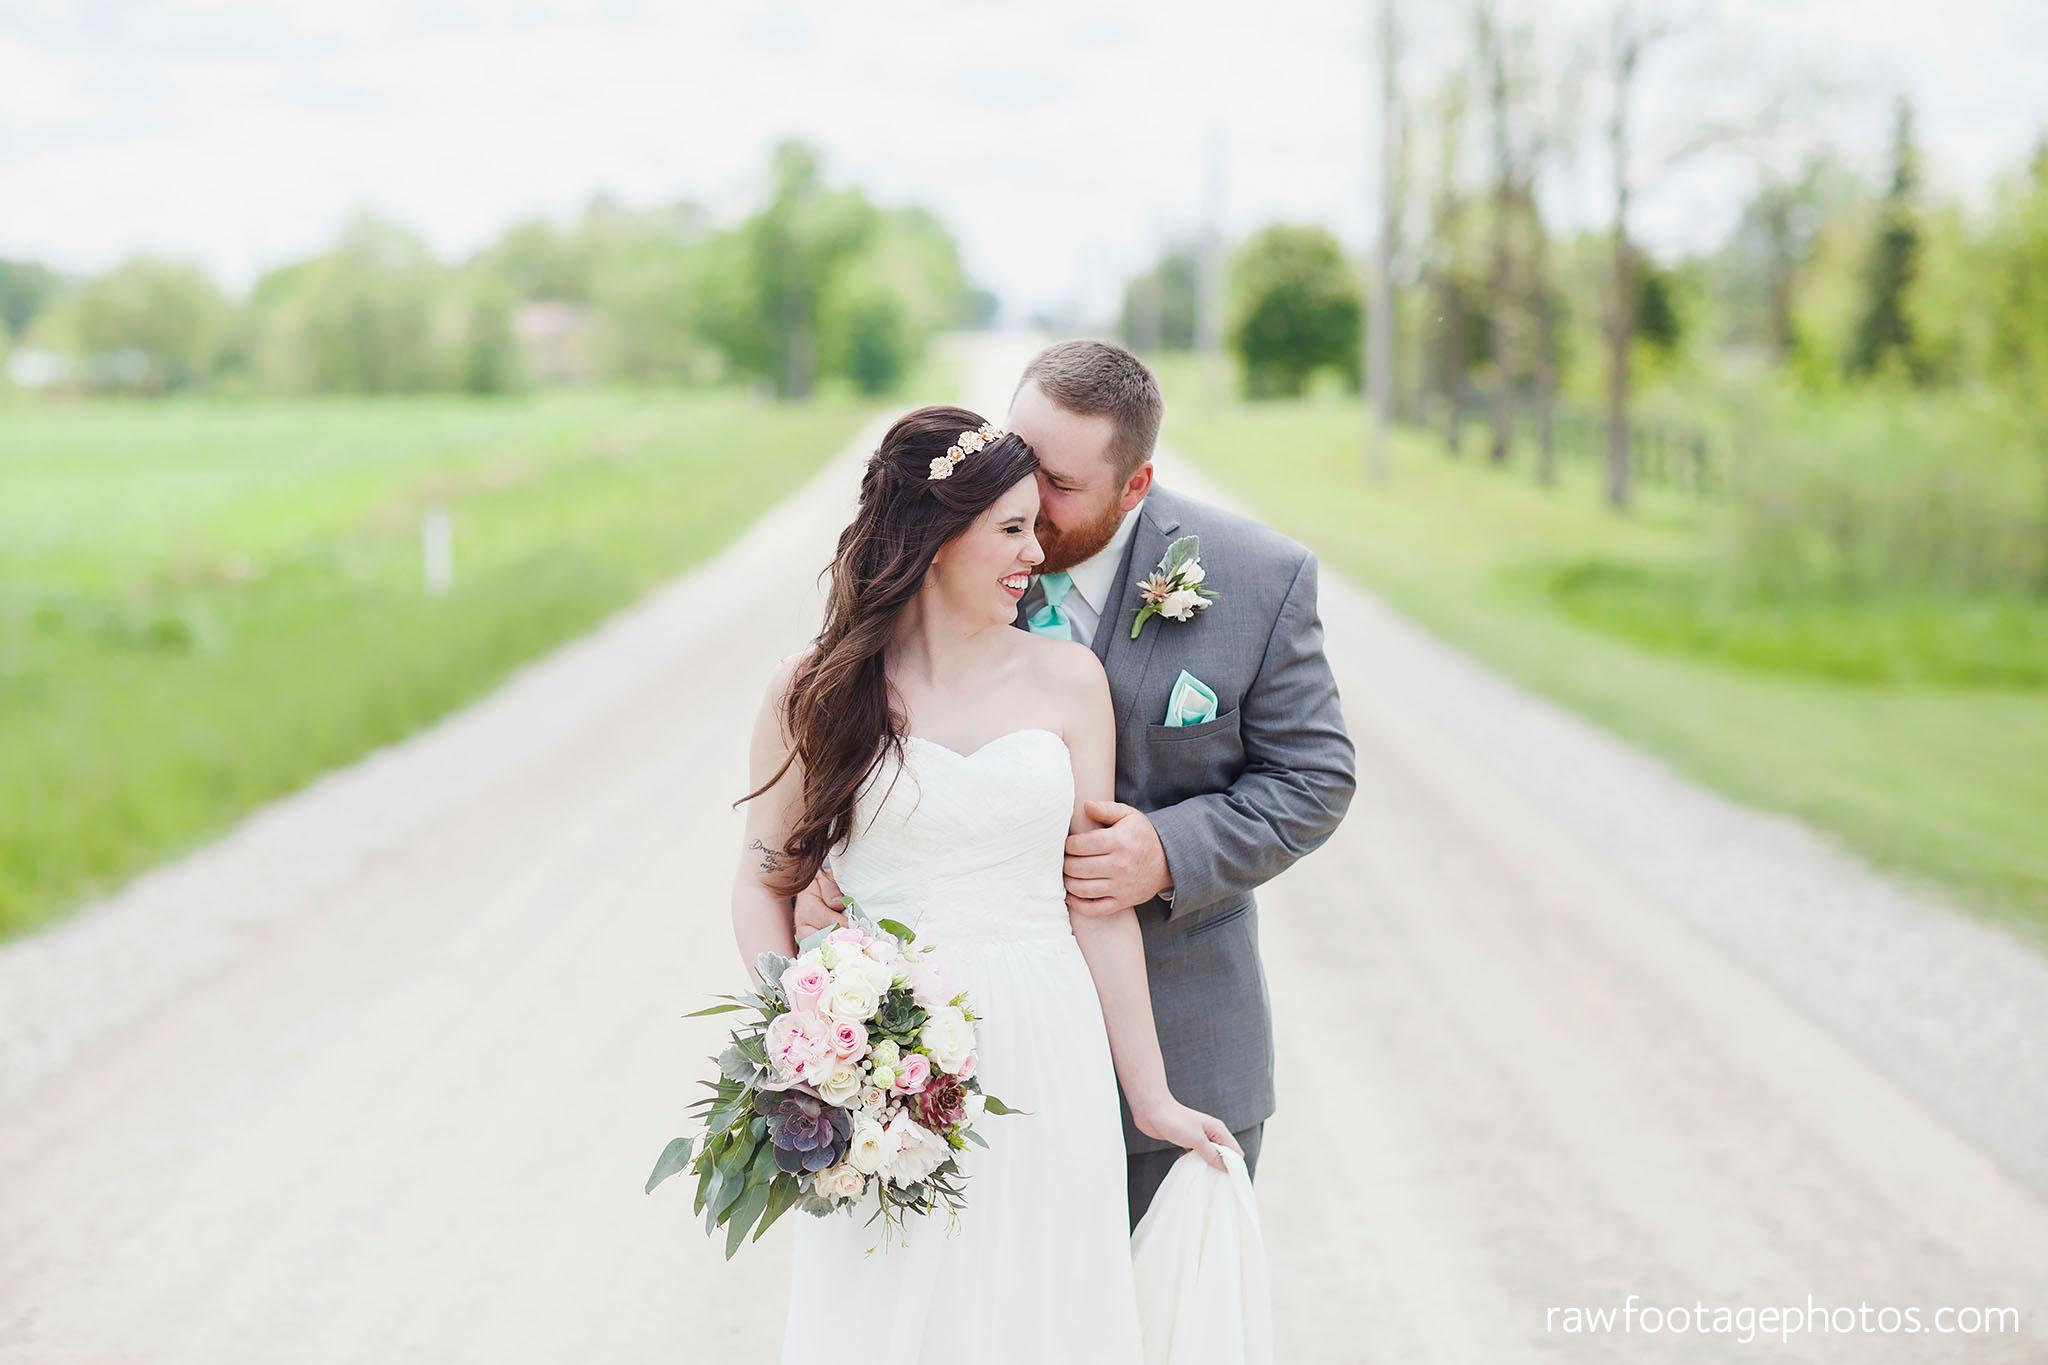 london_ontario_wedding_photographer-century_wedding_barn-raw_footage_photography-diy_wedding035.jpg